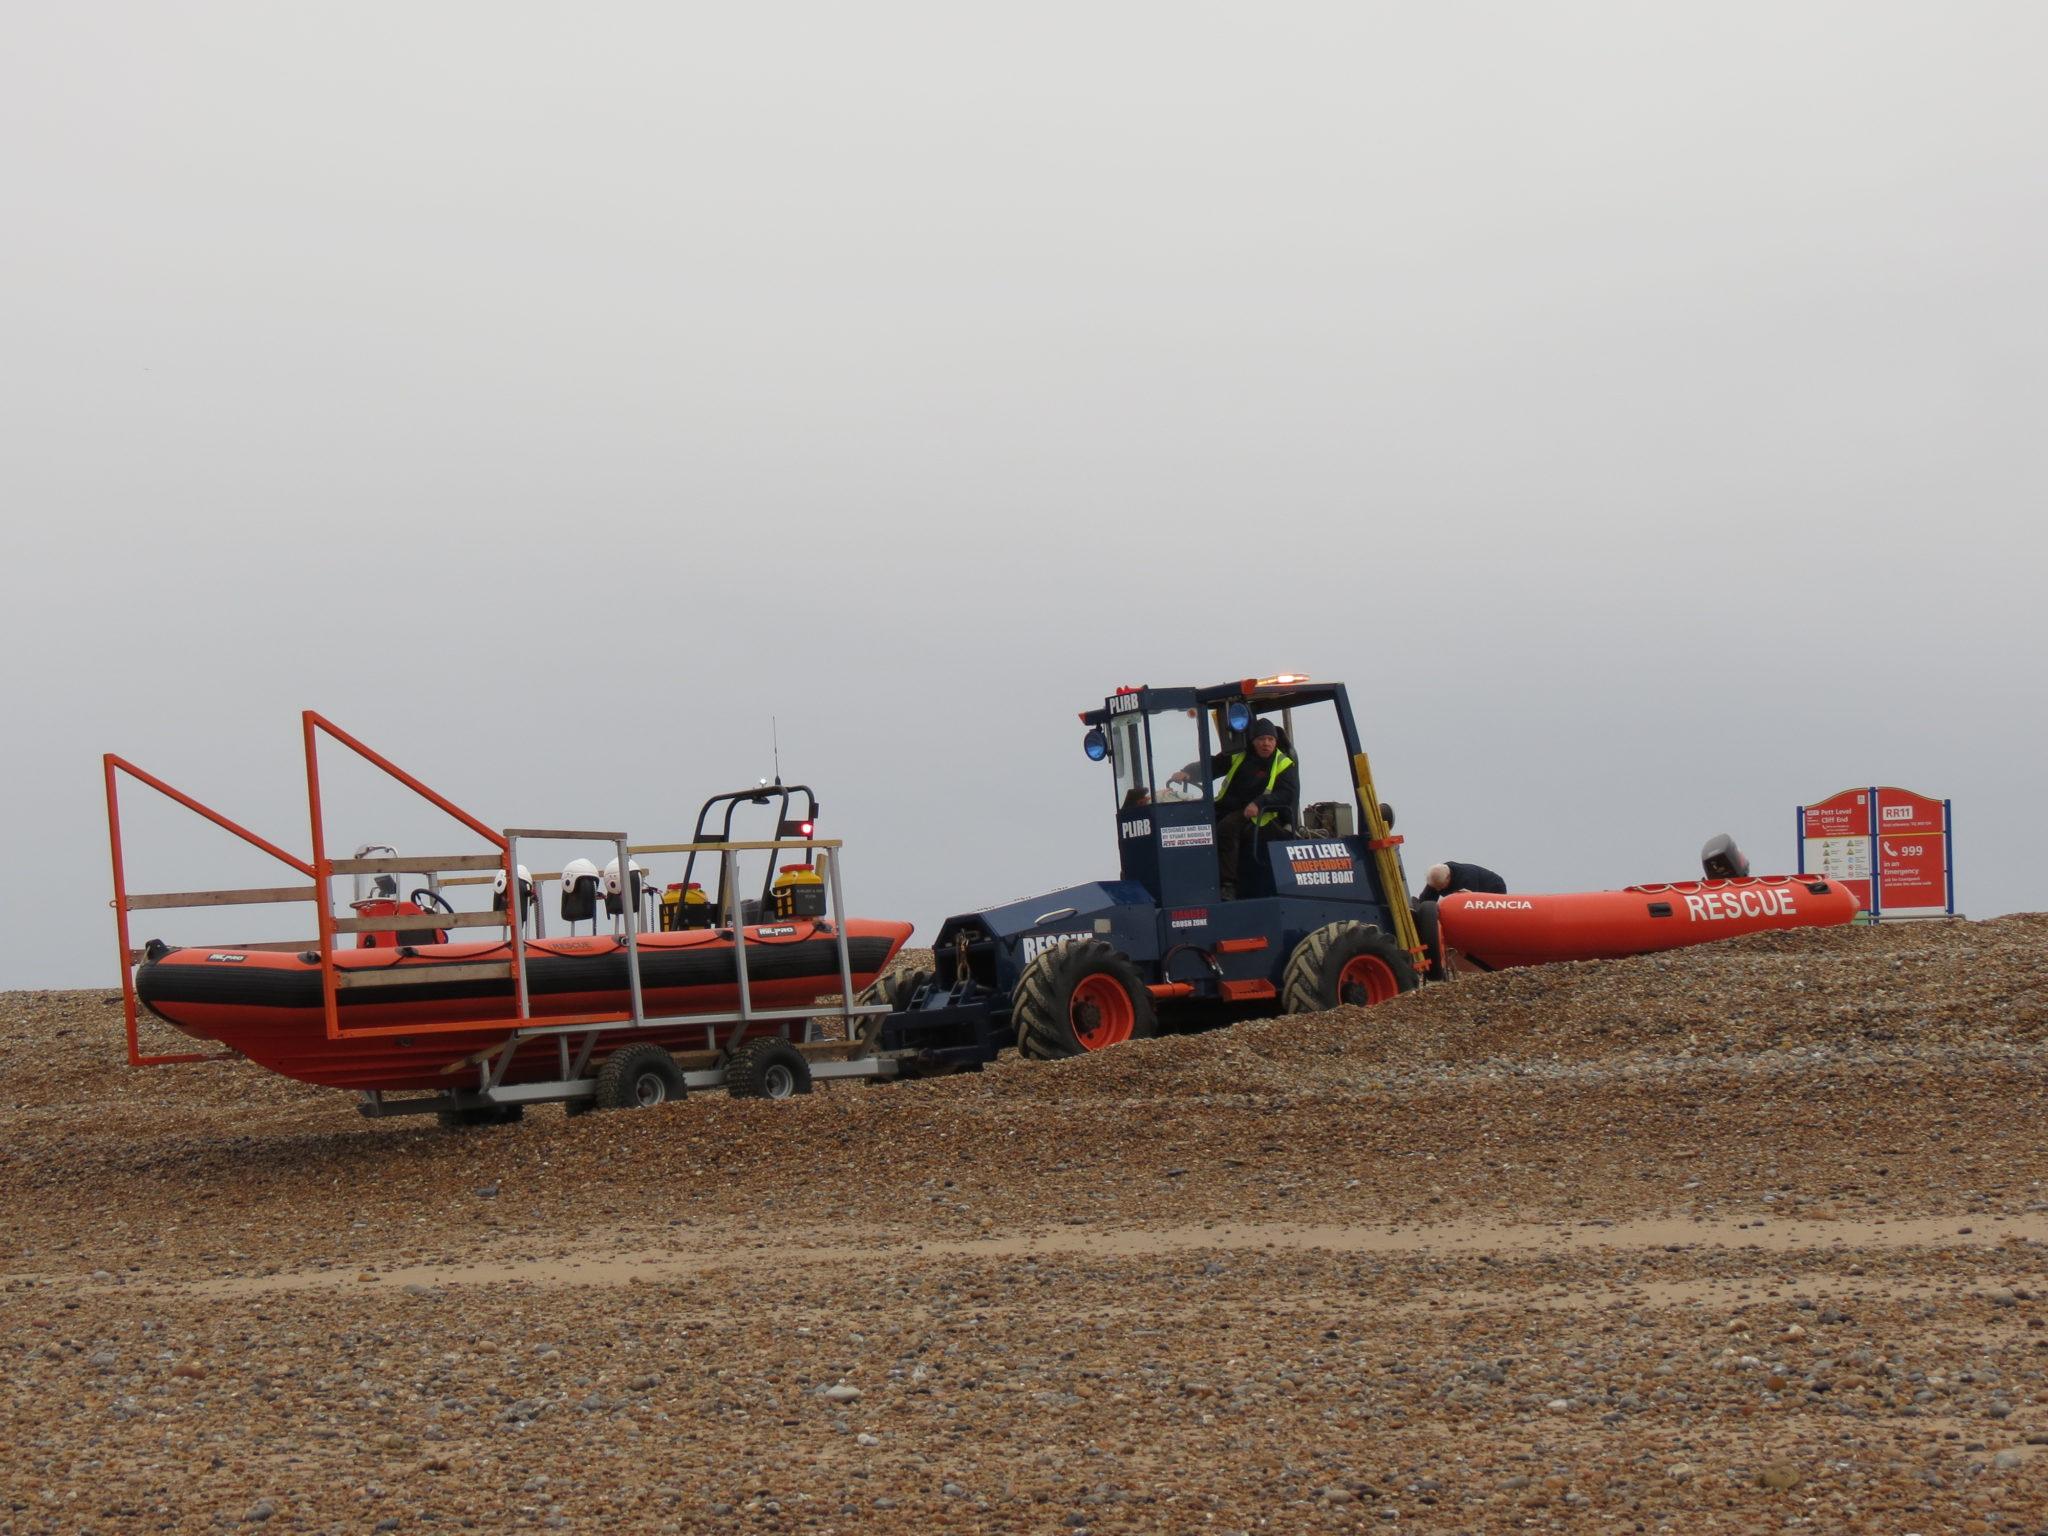 low tide double boat launch, training, beach rescue